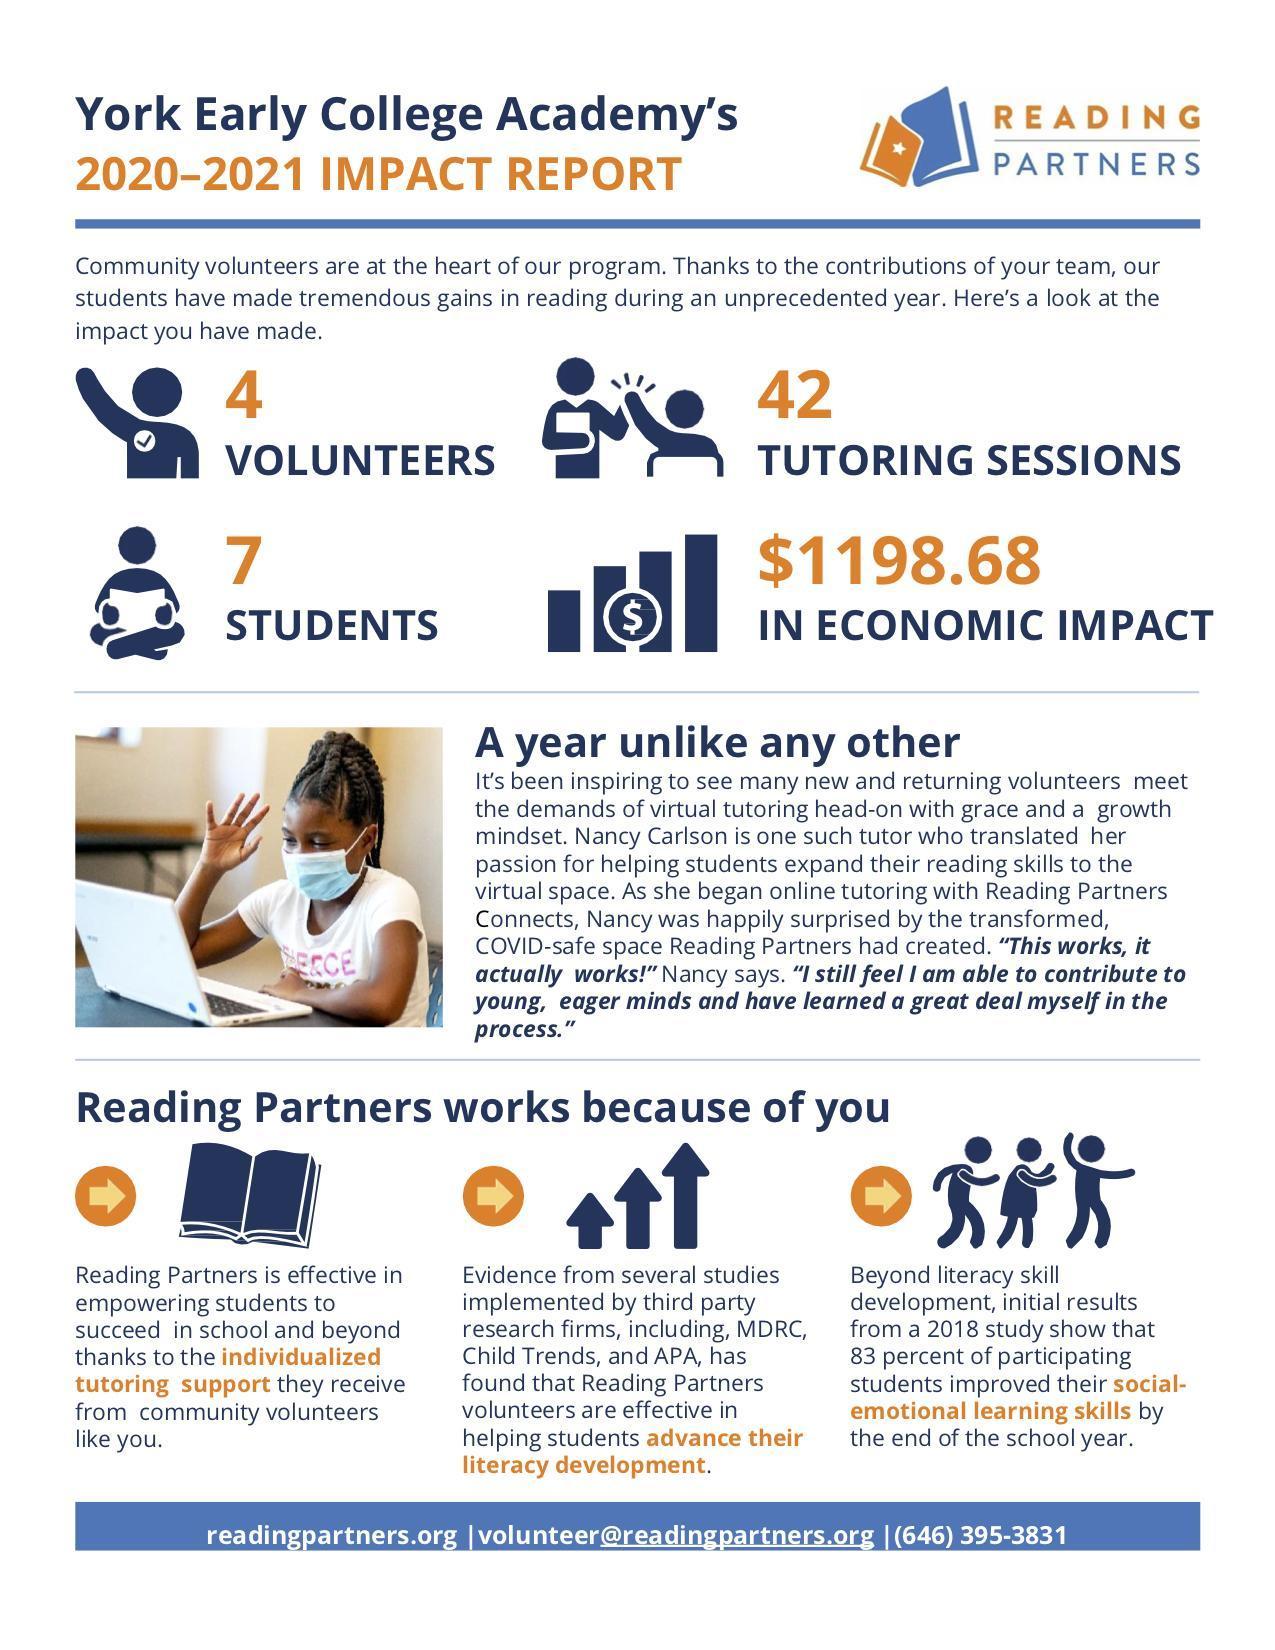 Reading Partners Impact Report